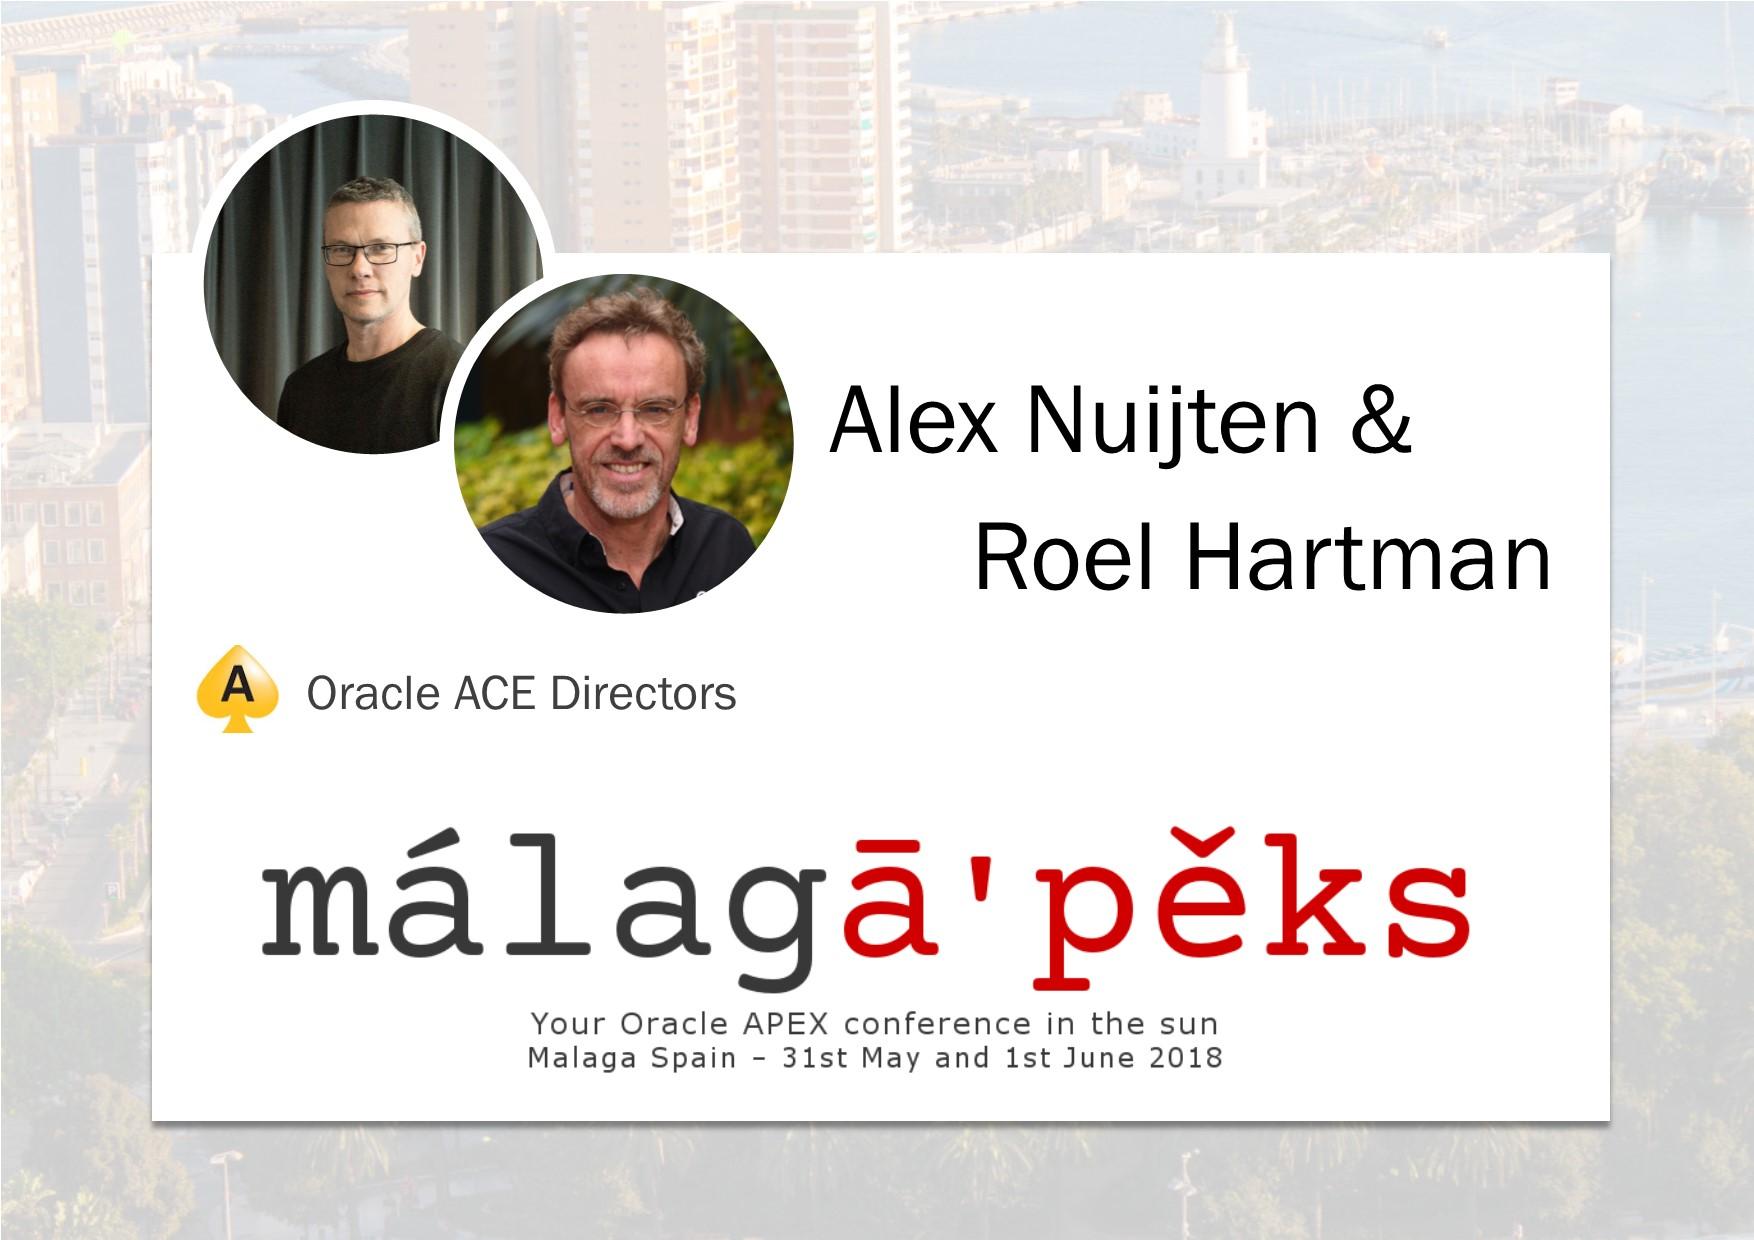 malagapex - alex & roel